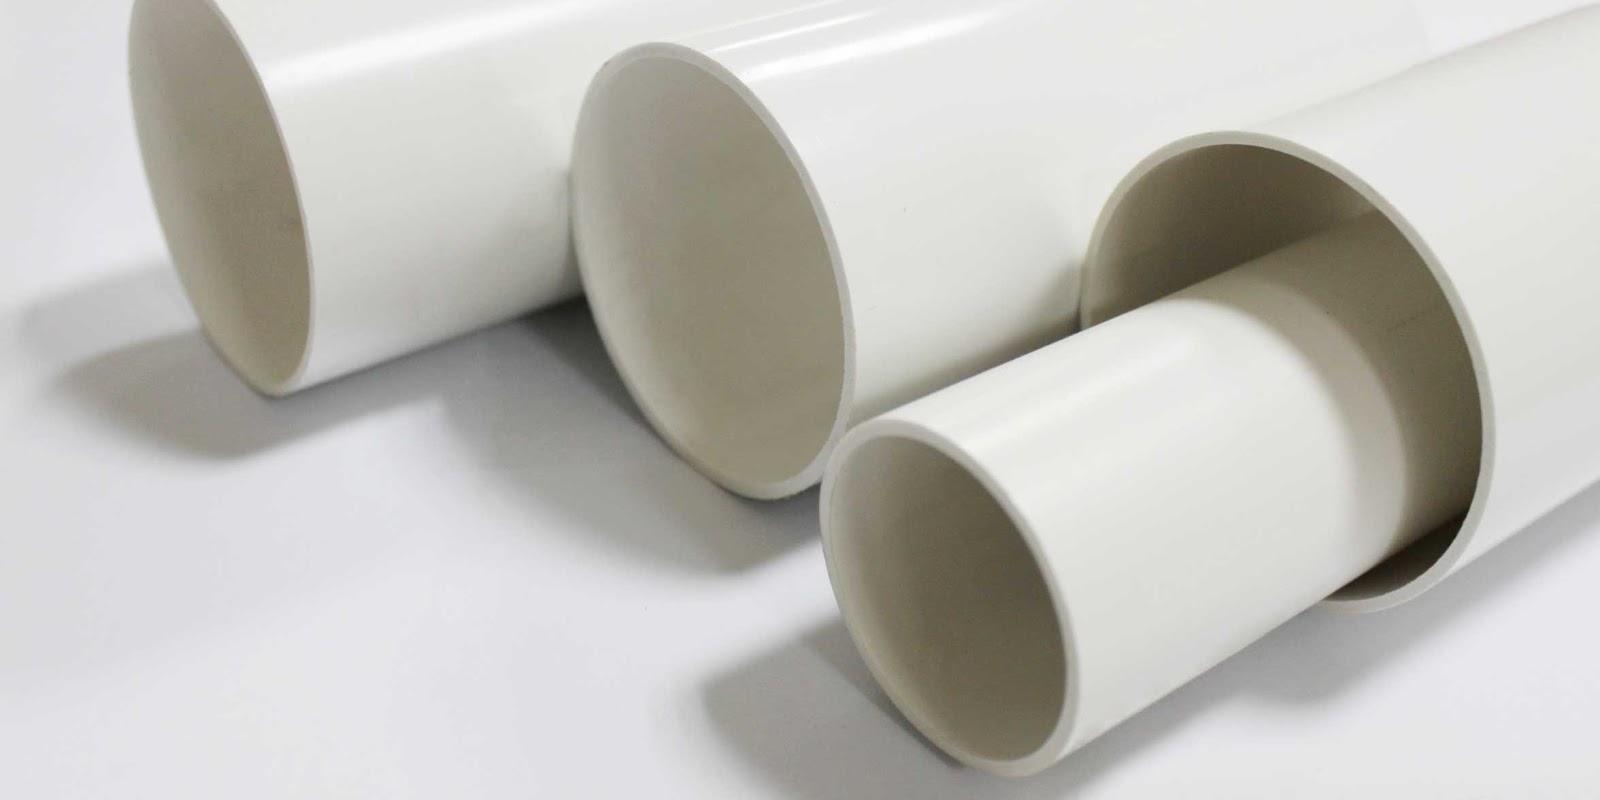 CPVC, PVC & UPVC Plastic Pipes & Fittings in India